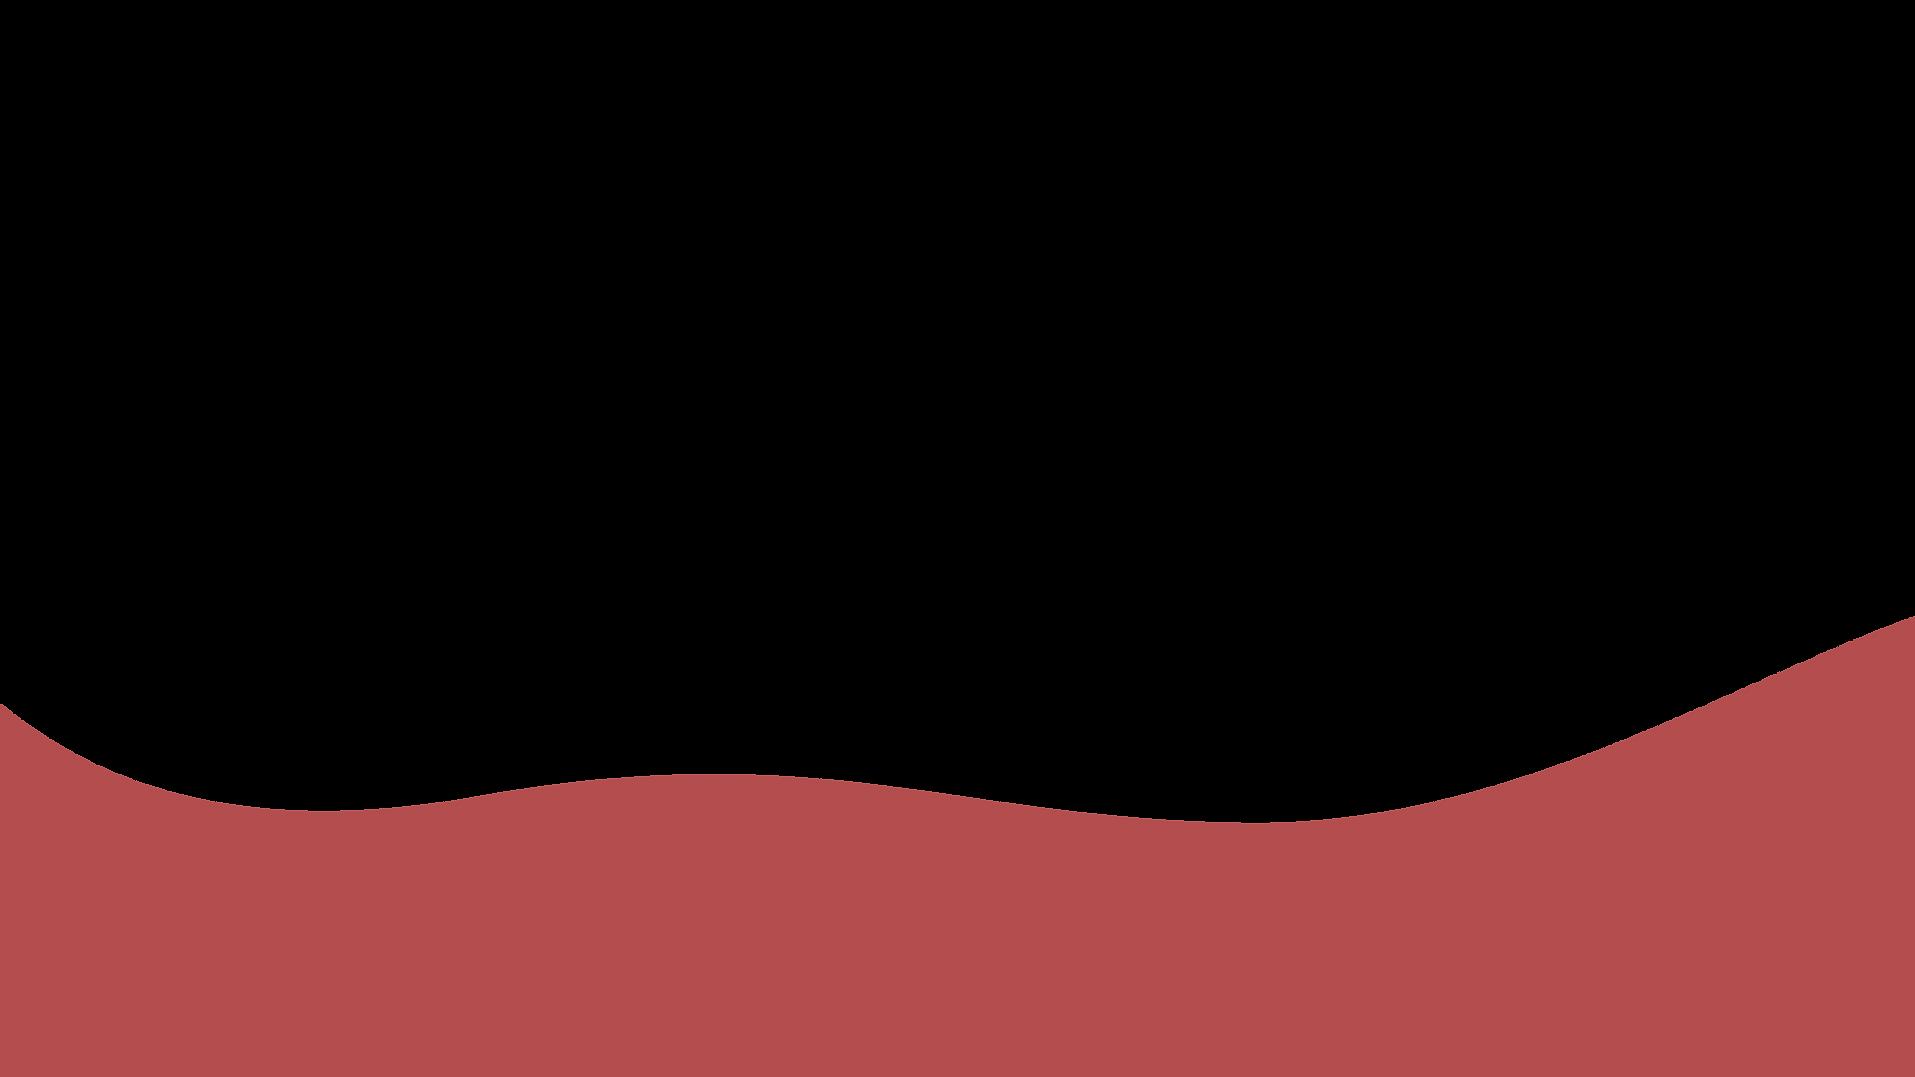 Schwung_Rot_Full_2_Zeichenfläche_1.png